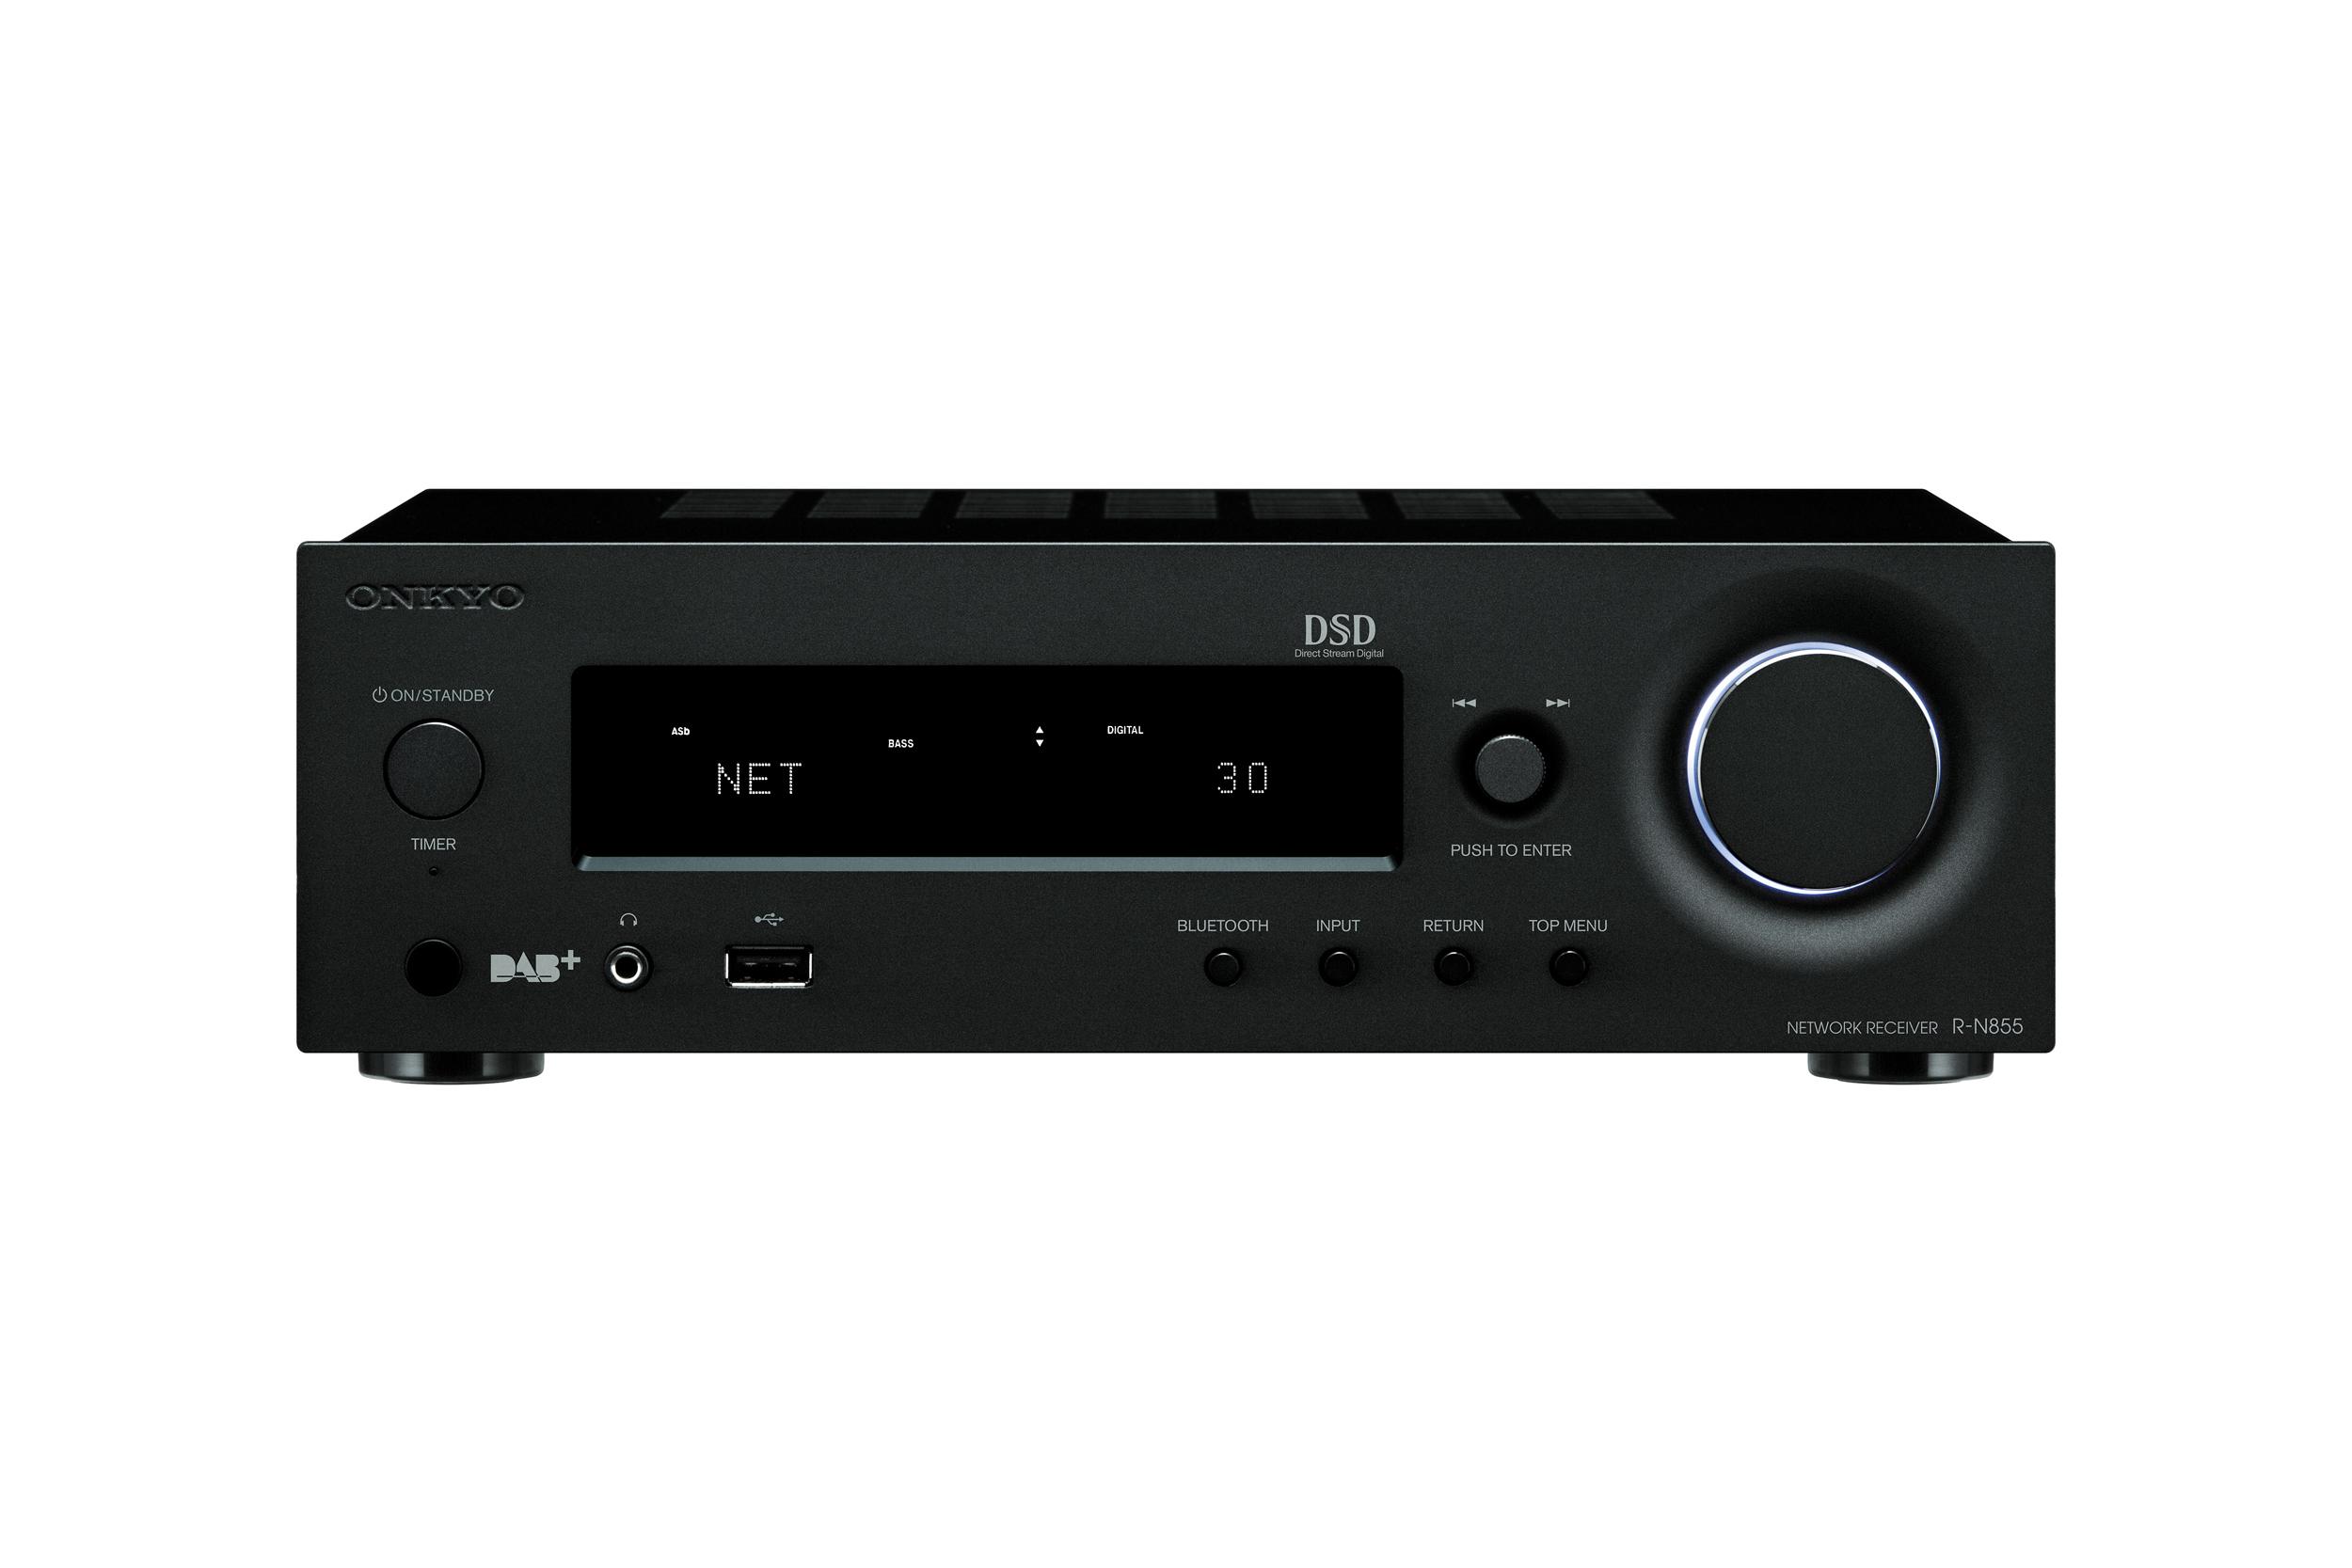 R-N855-B, HIFI RECEIVER, black